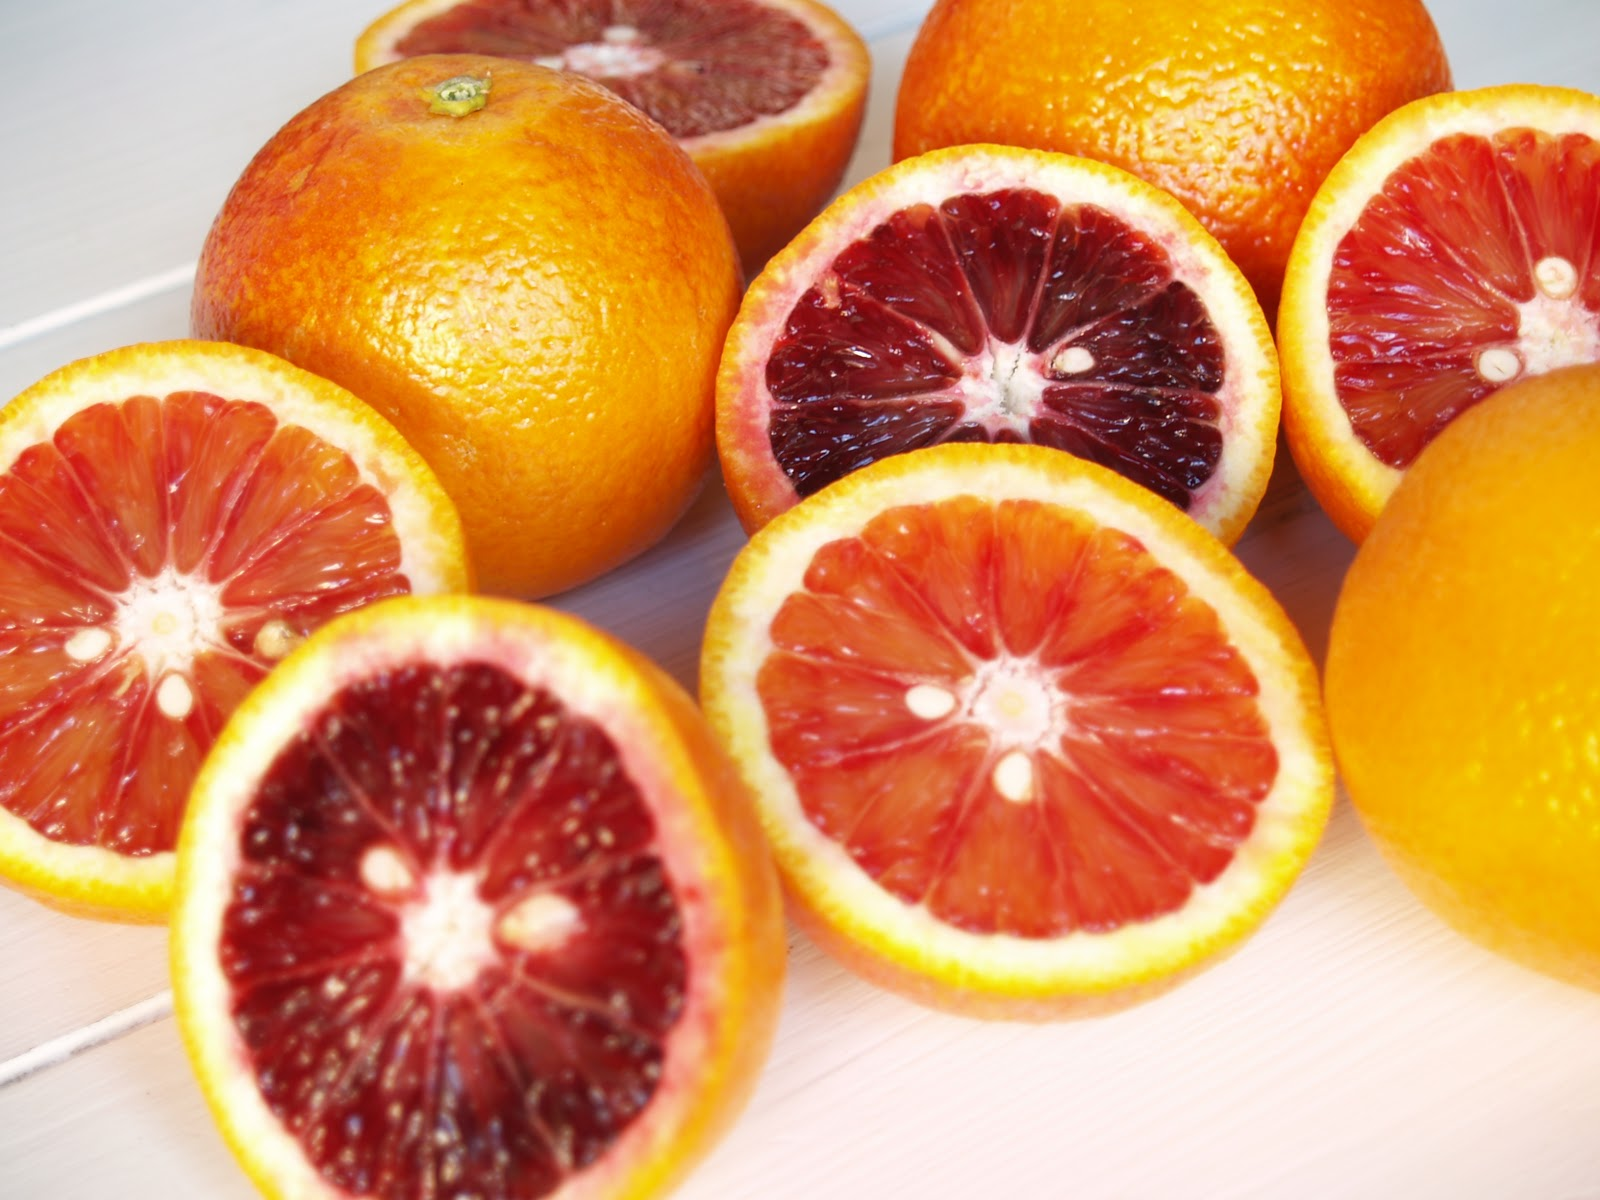 Persimmon and Peach: Ice Cream #12: Blood Orange Sherbet